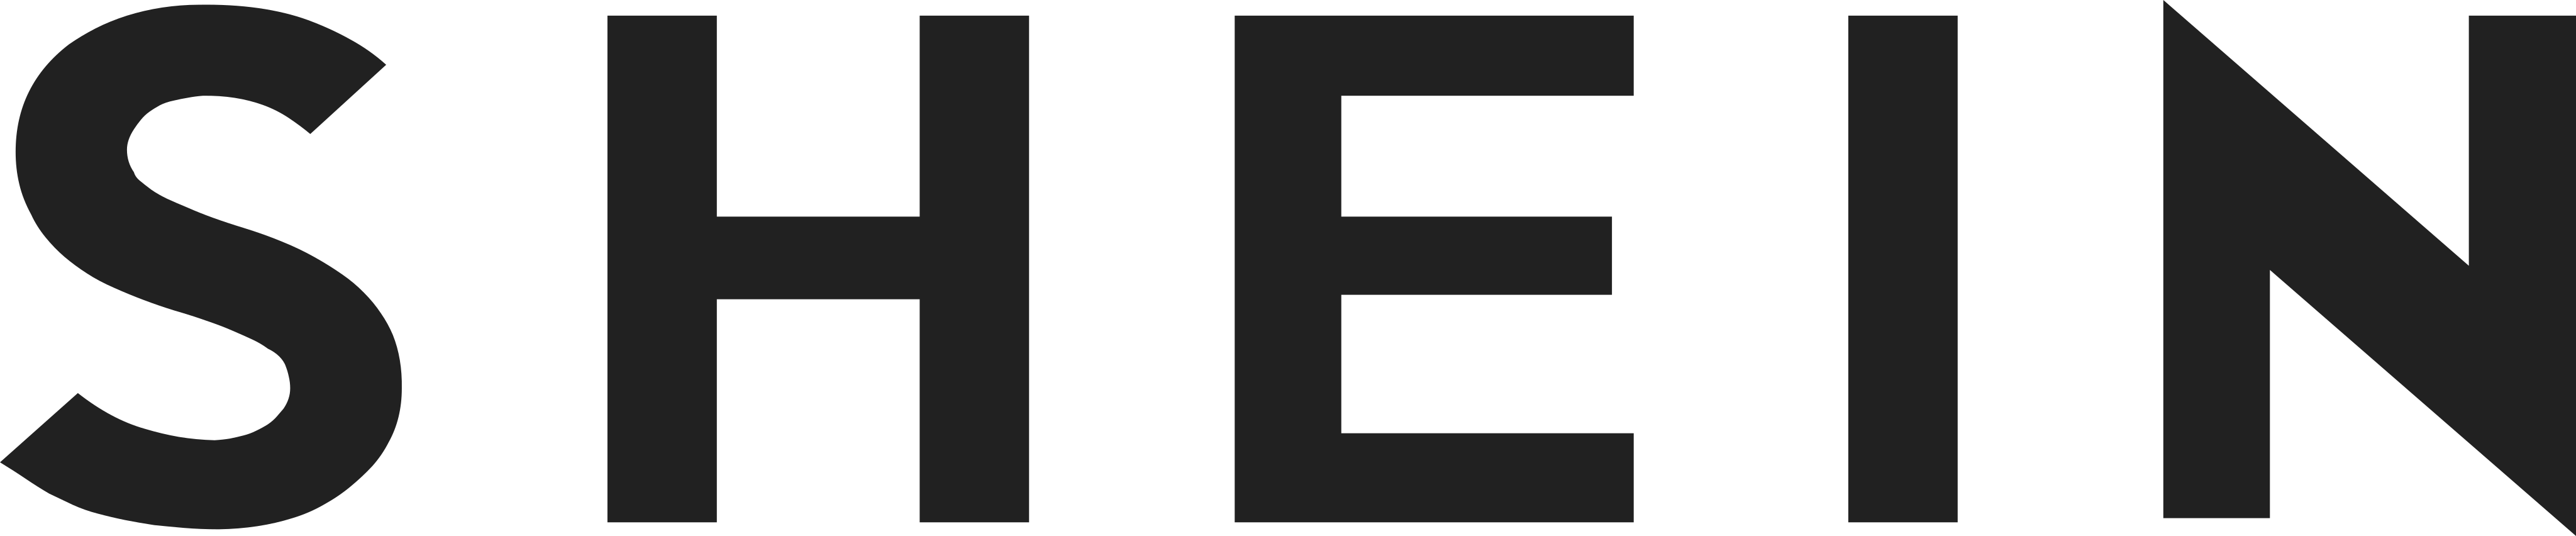 Shein Logo.